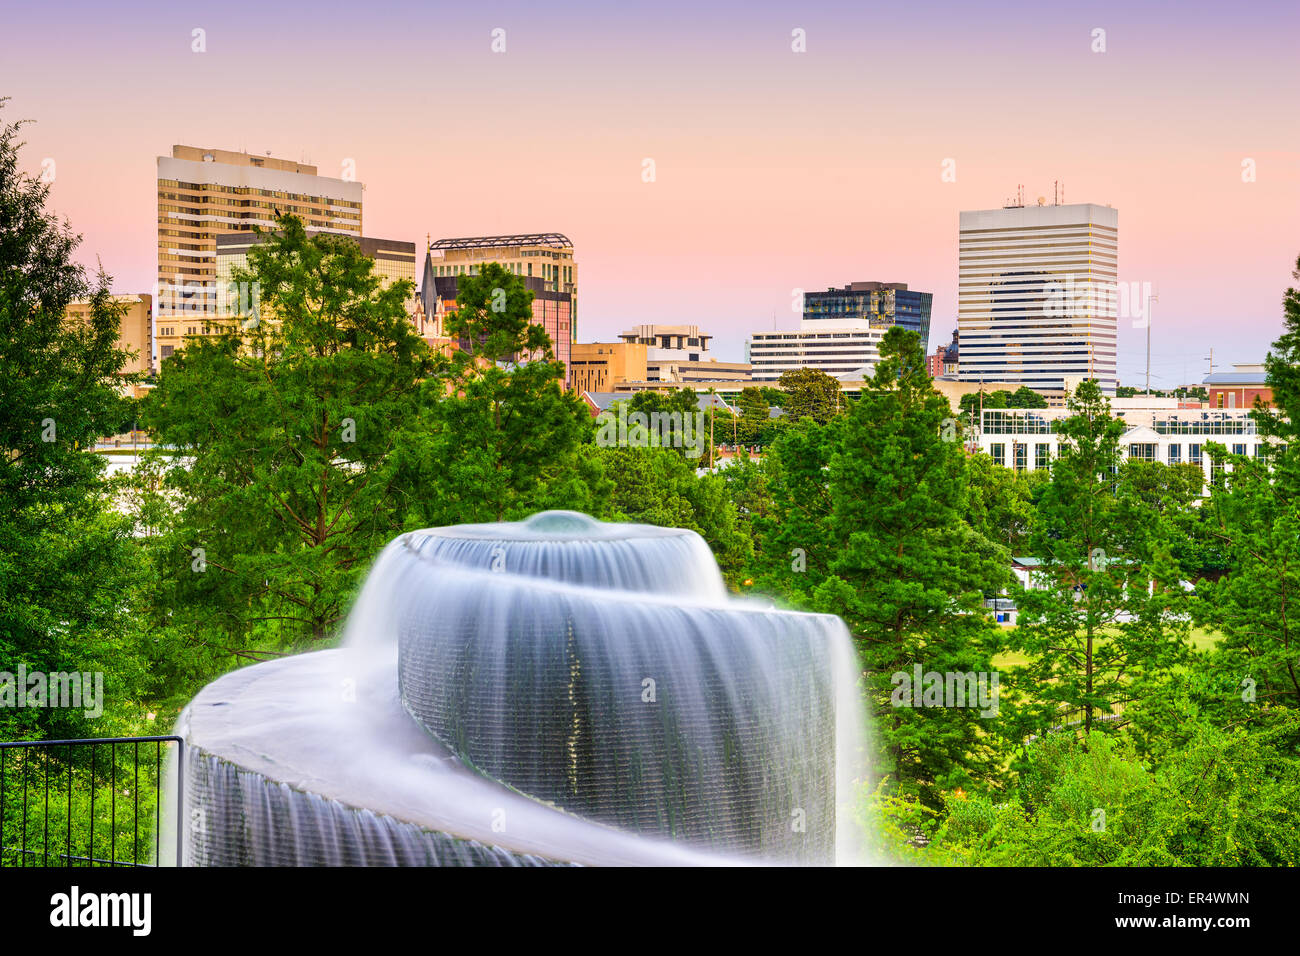 Columbia, South Carolina, USA at Finlay Park Fountain. - Stock Image